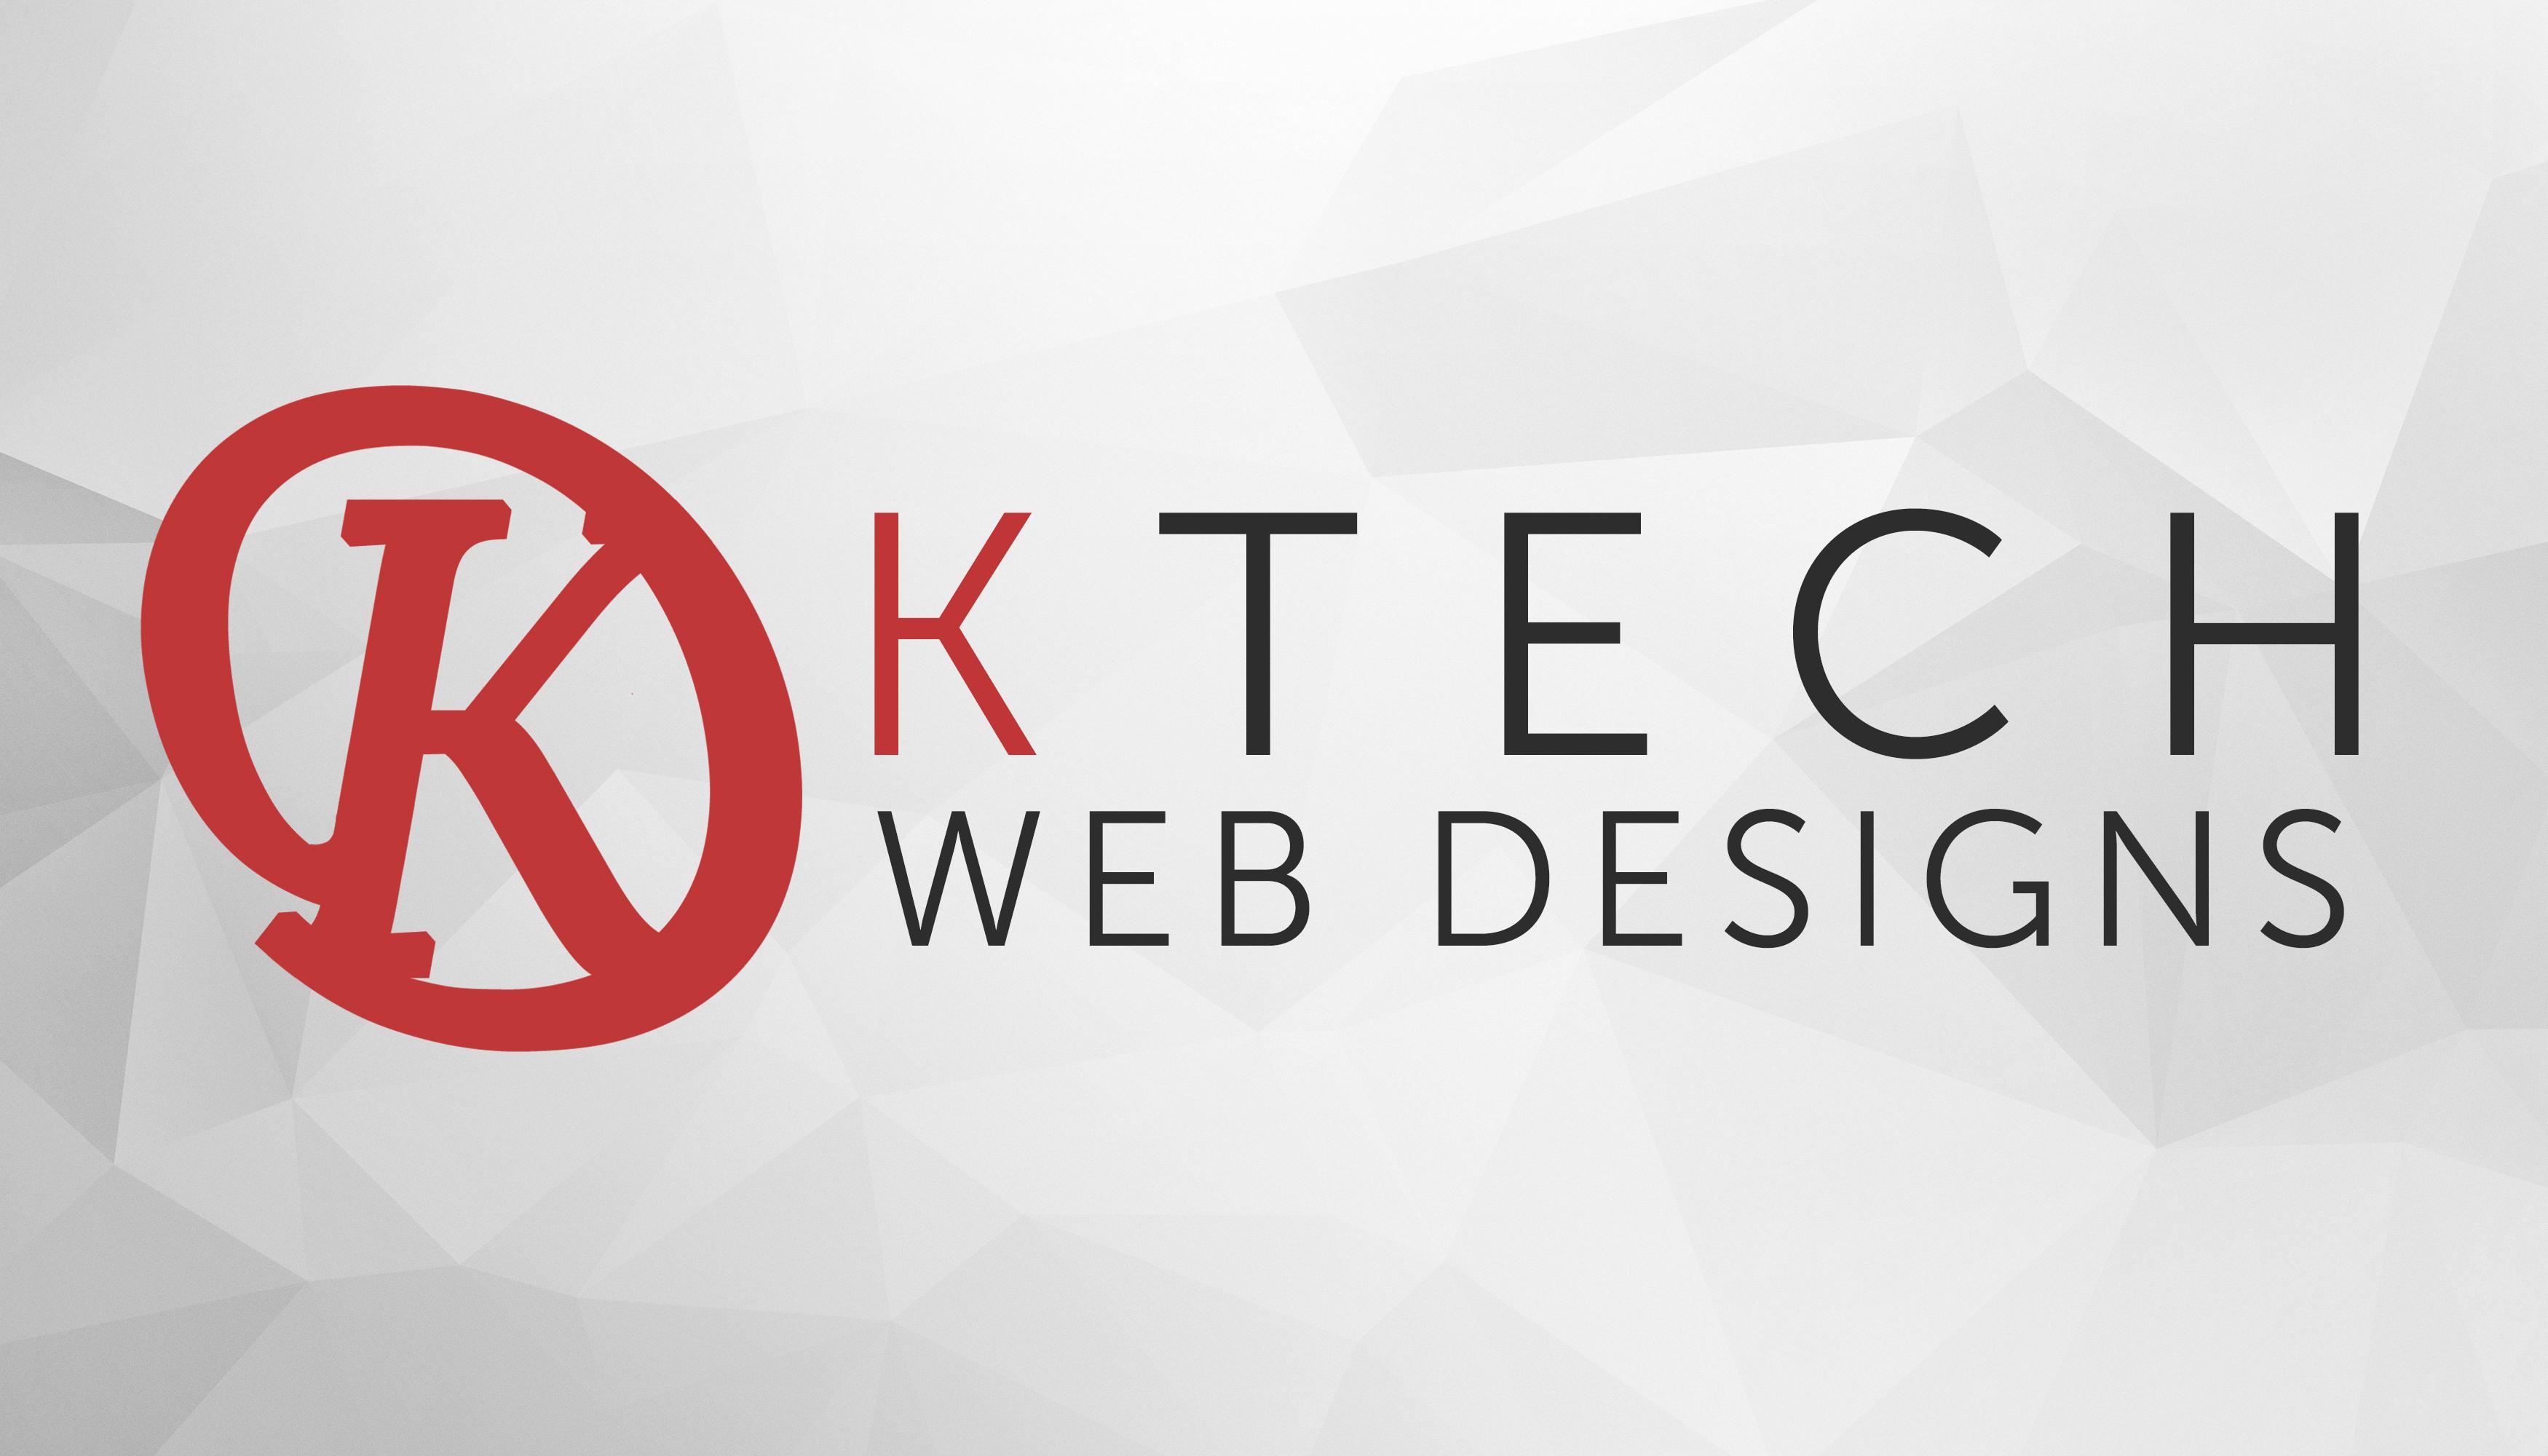 KTech Web Designs